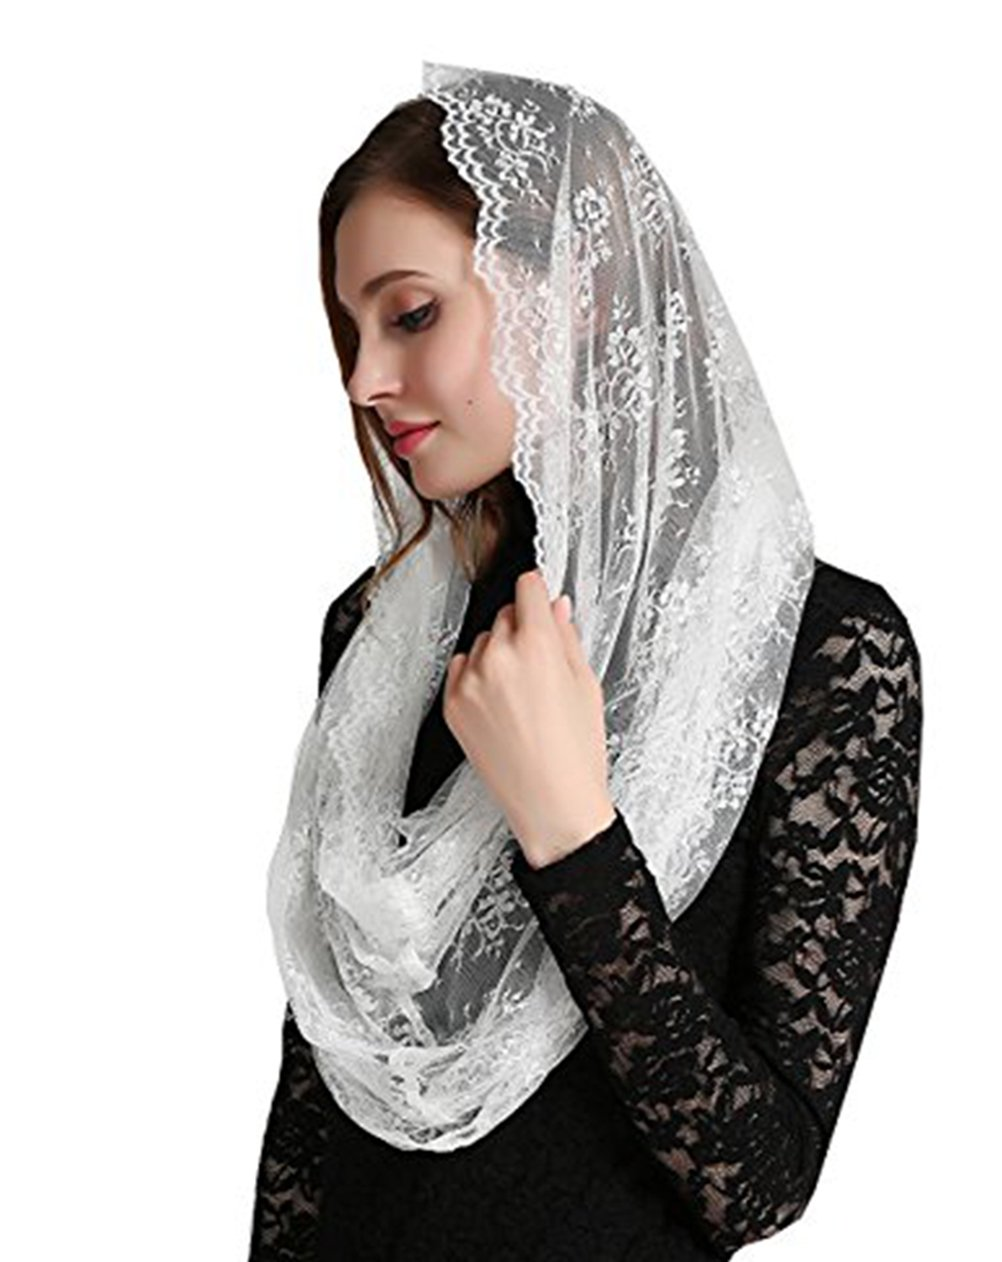 Ivory Hotsale Chapel Church Veil Lace Catholic Mantilla infinity veil v43 (Wrap)